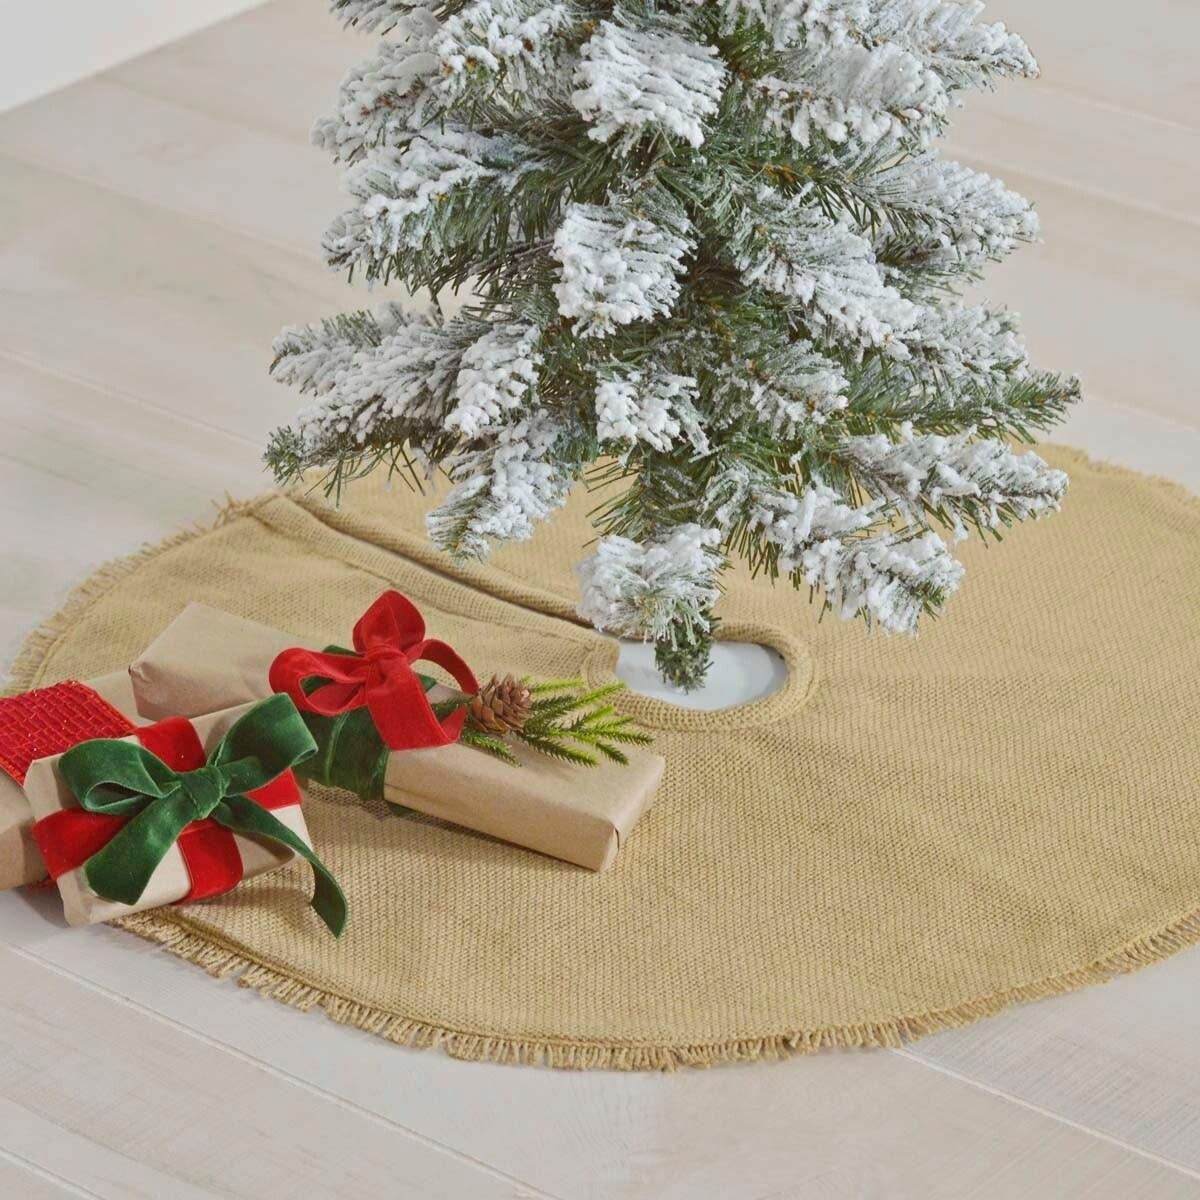 Festive Burlap Mini Tree Skirt Free Shipping On Orders Over 45 17807293